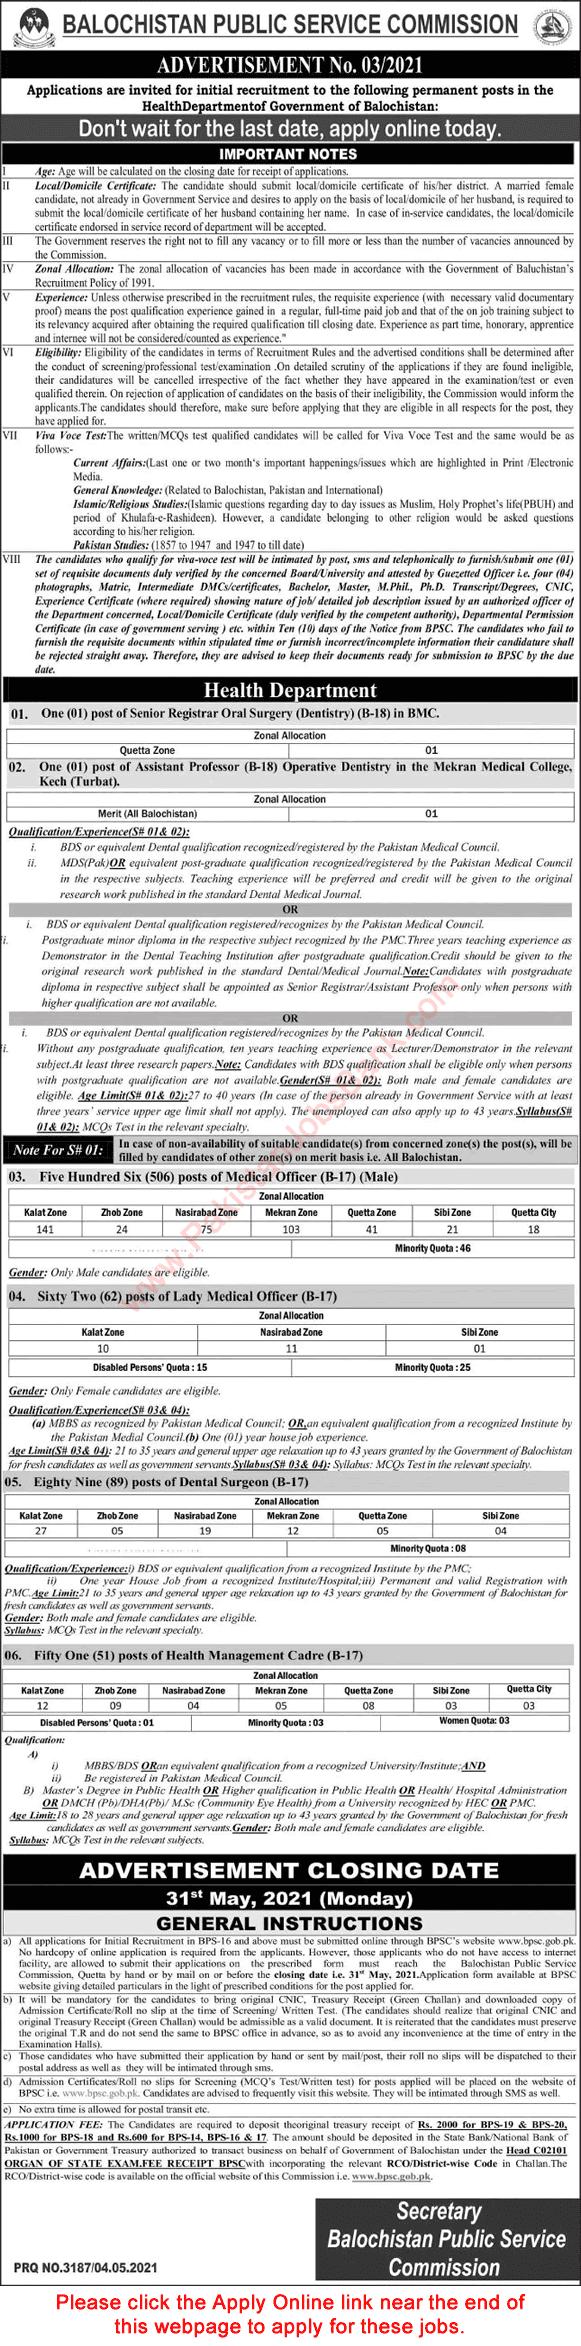 Balochistan Public Service Commission (BPSC) Jobs 2021 in Pakistan